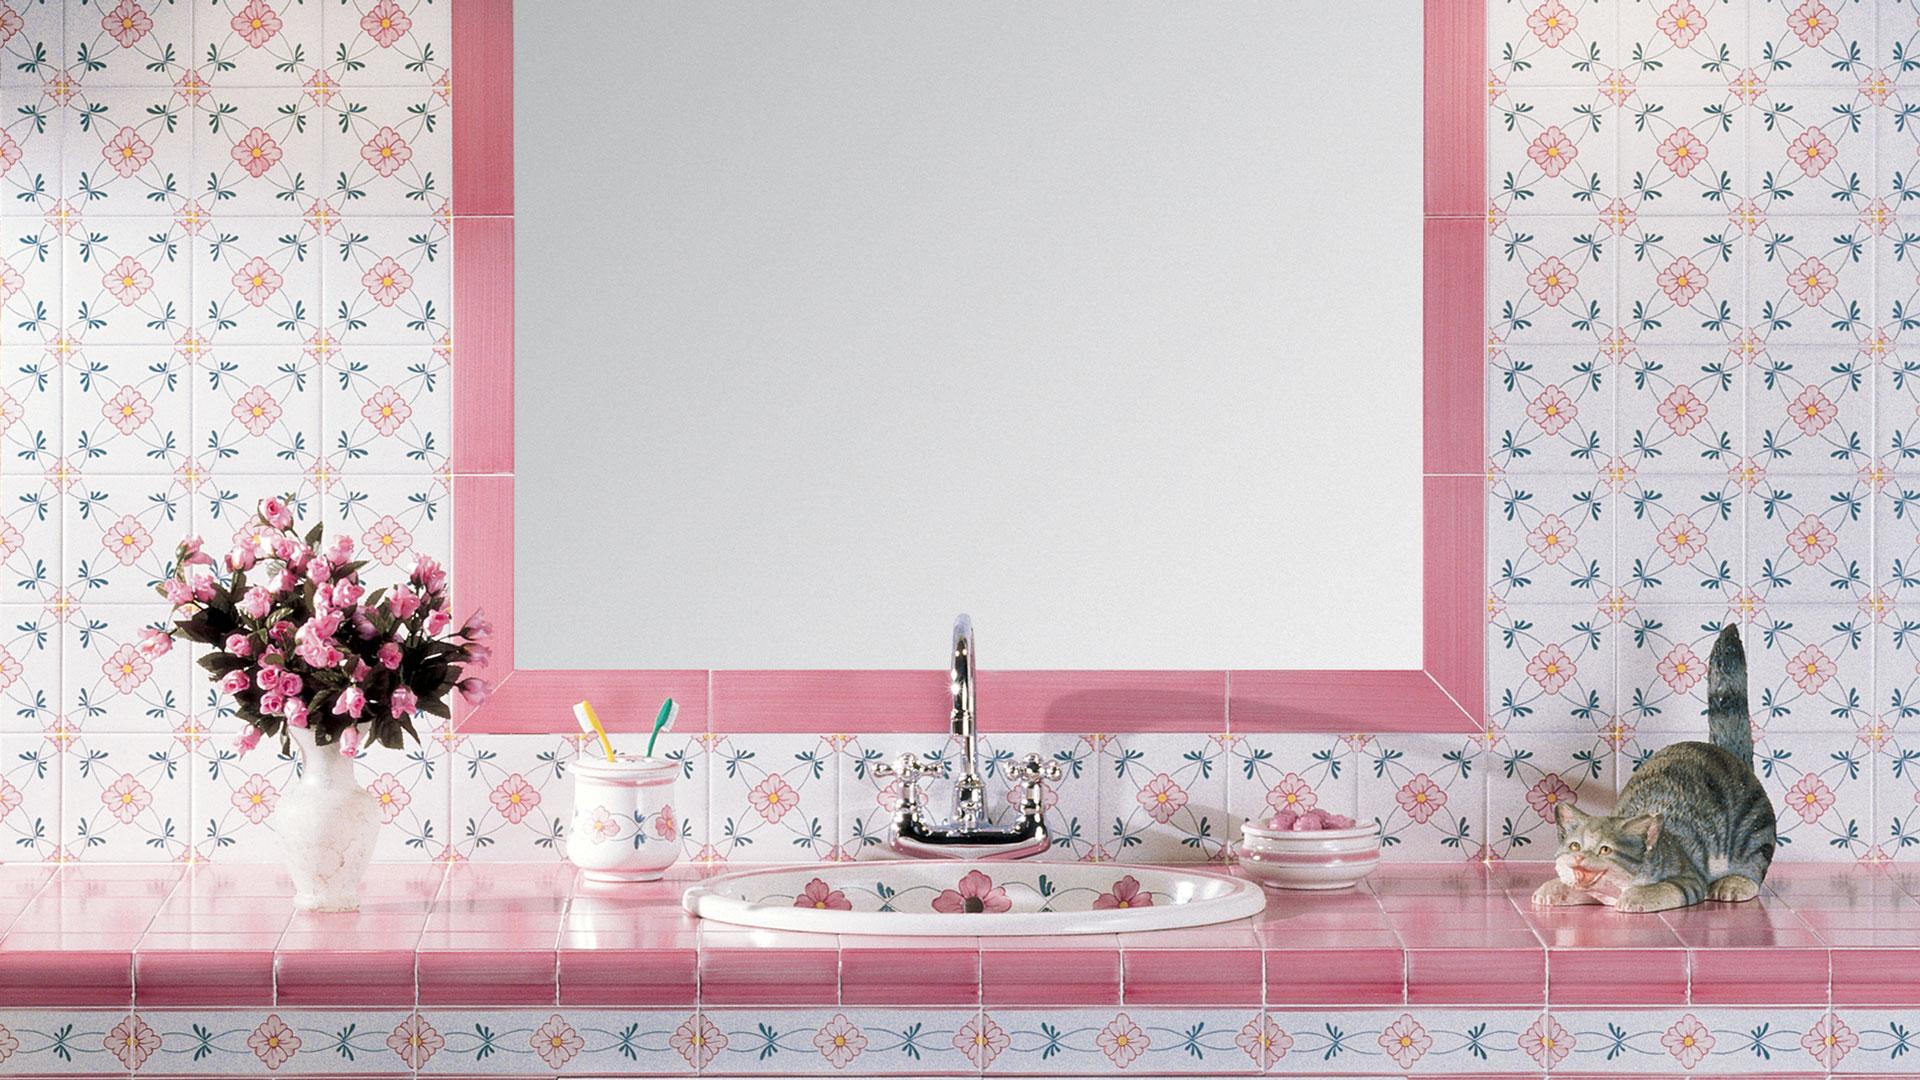 3_ambiente-caterina-rosa-13x13